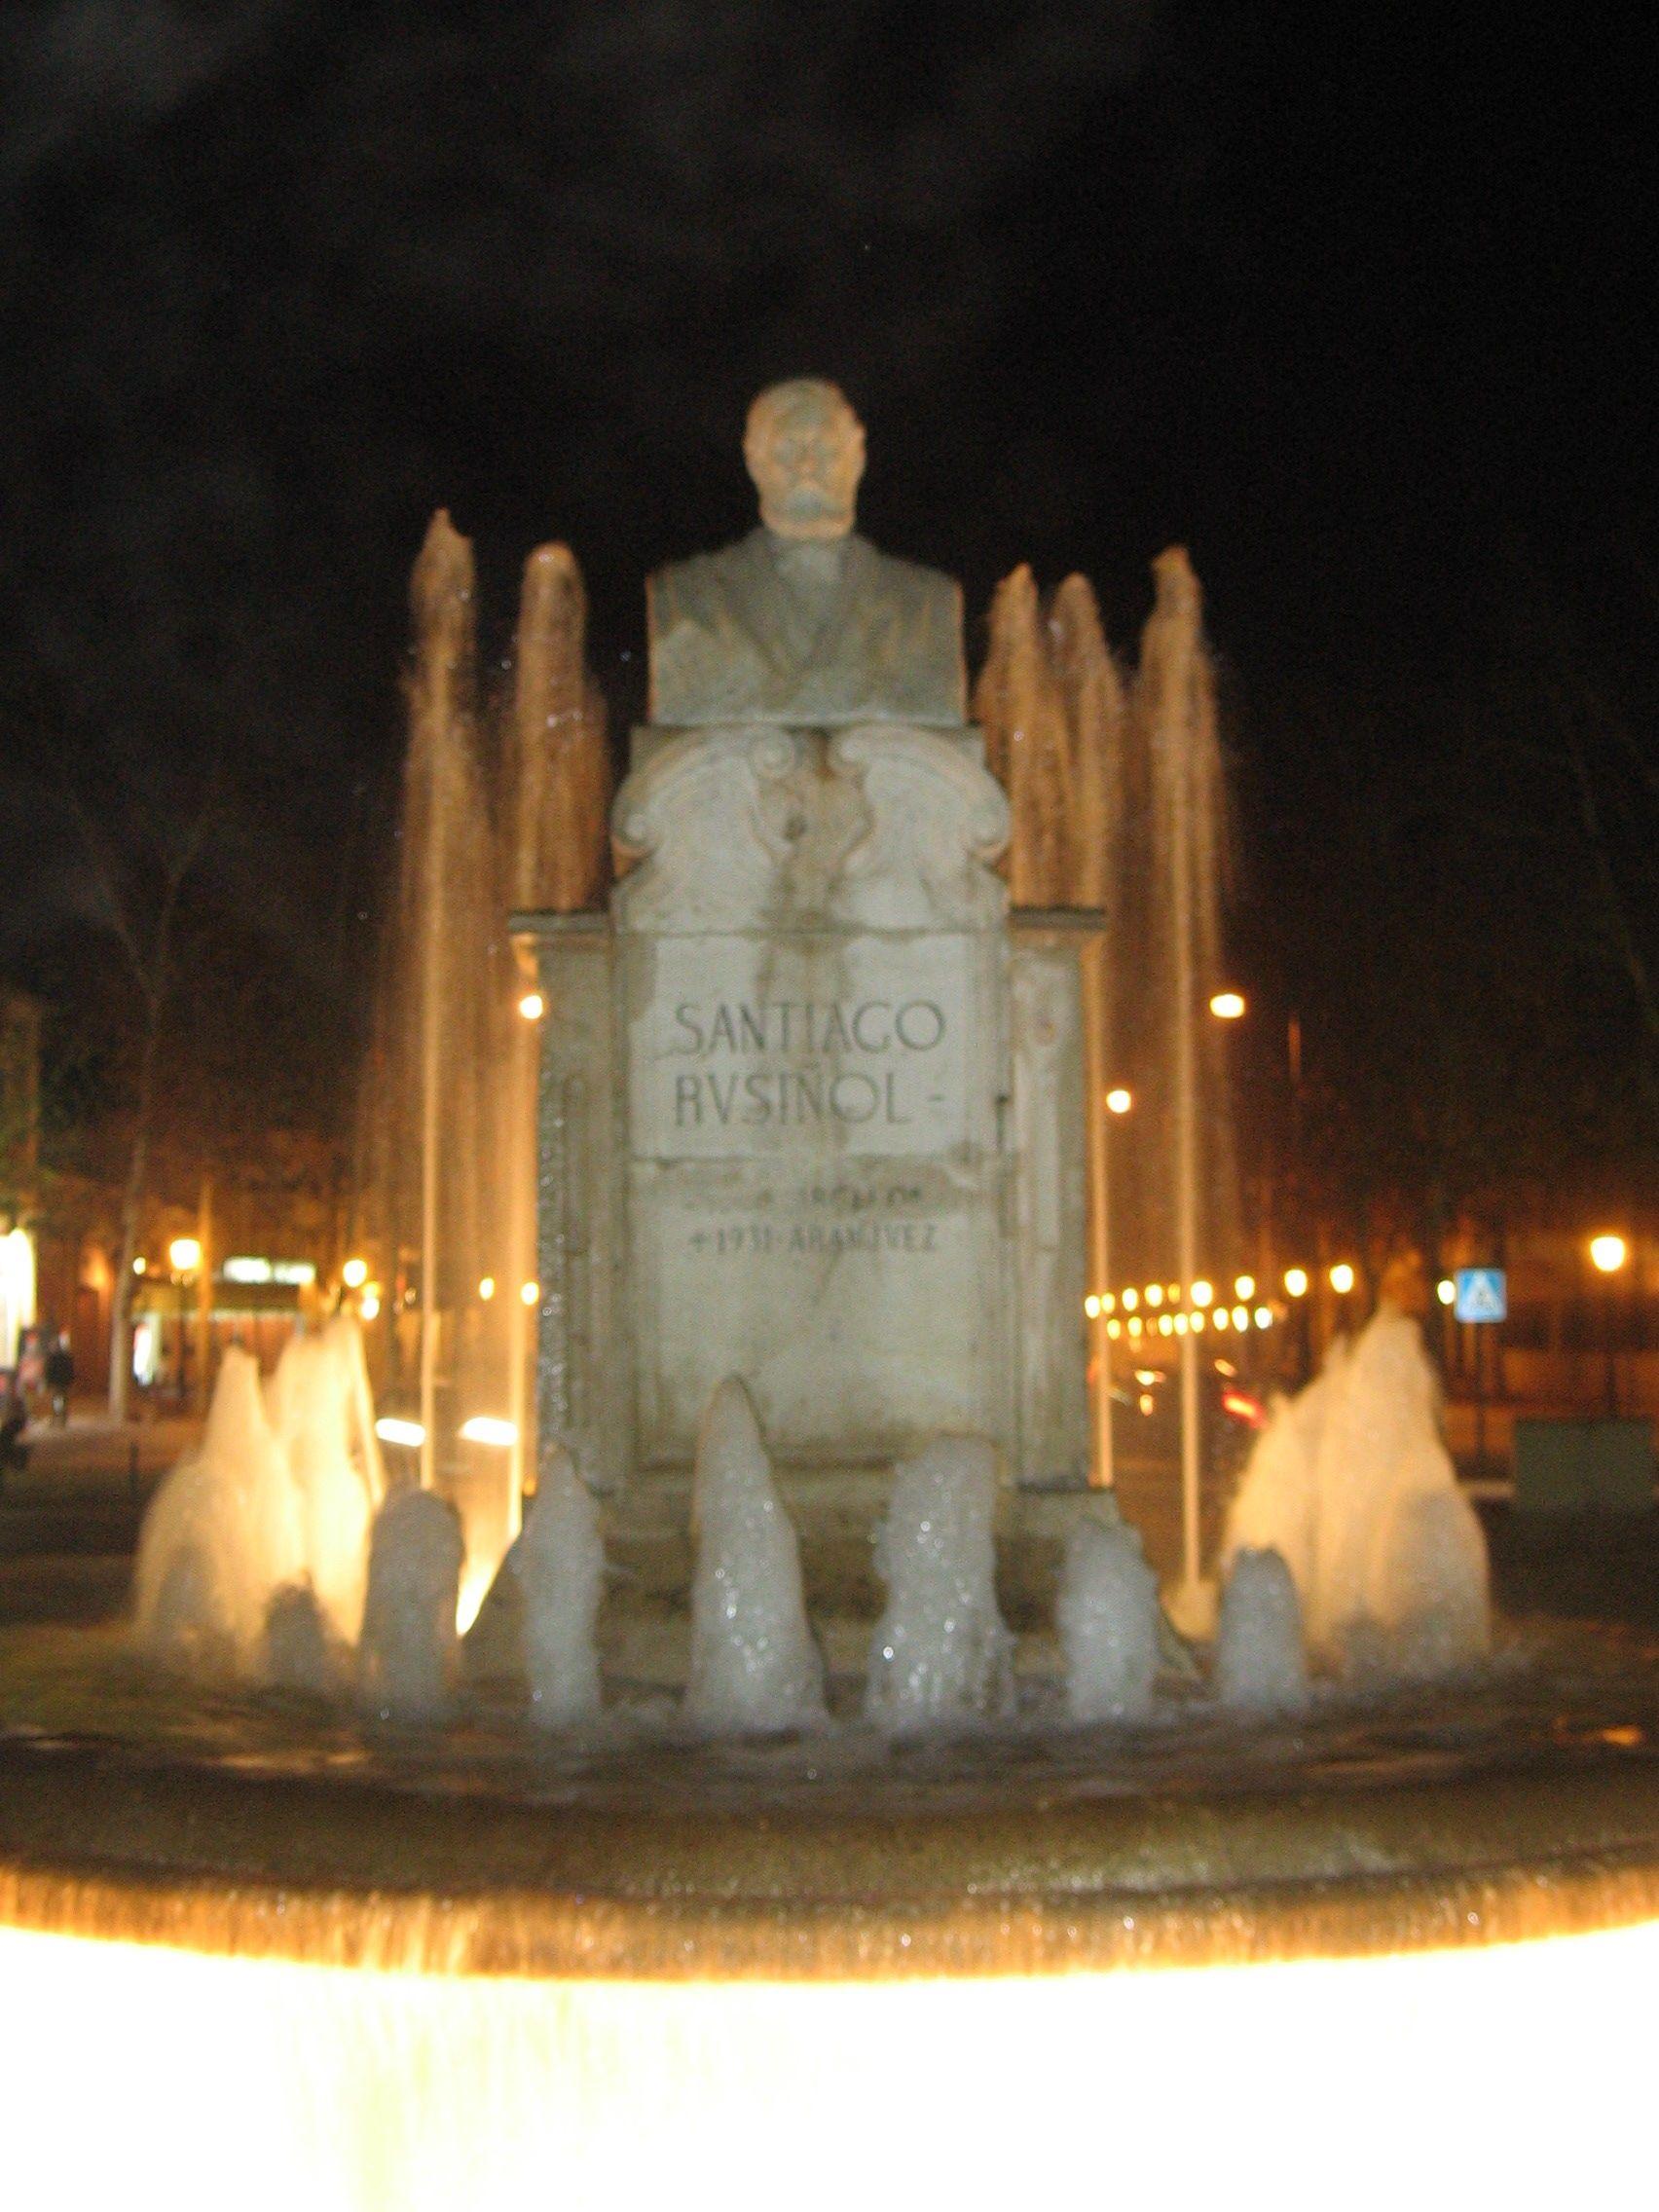 Ficheiro santiago rusi ol wikip dia a for Muebles santiago aranjuez